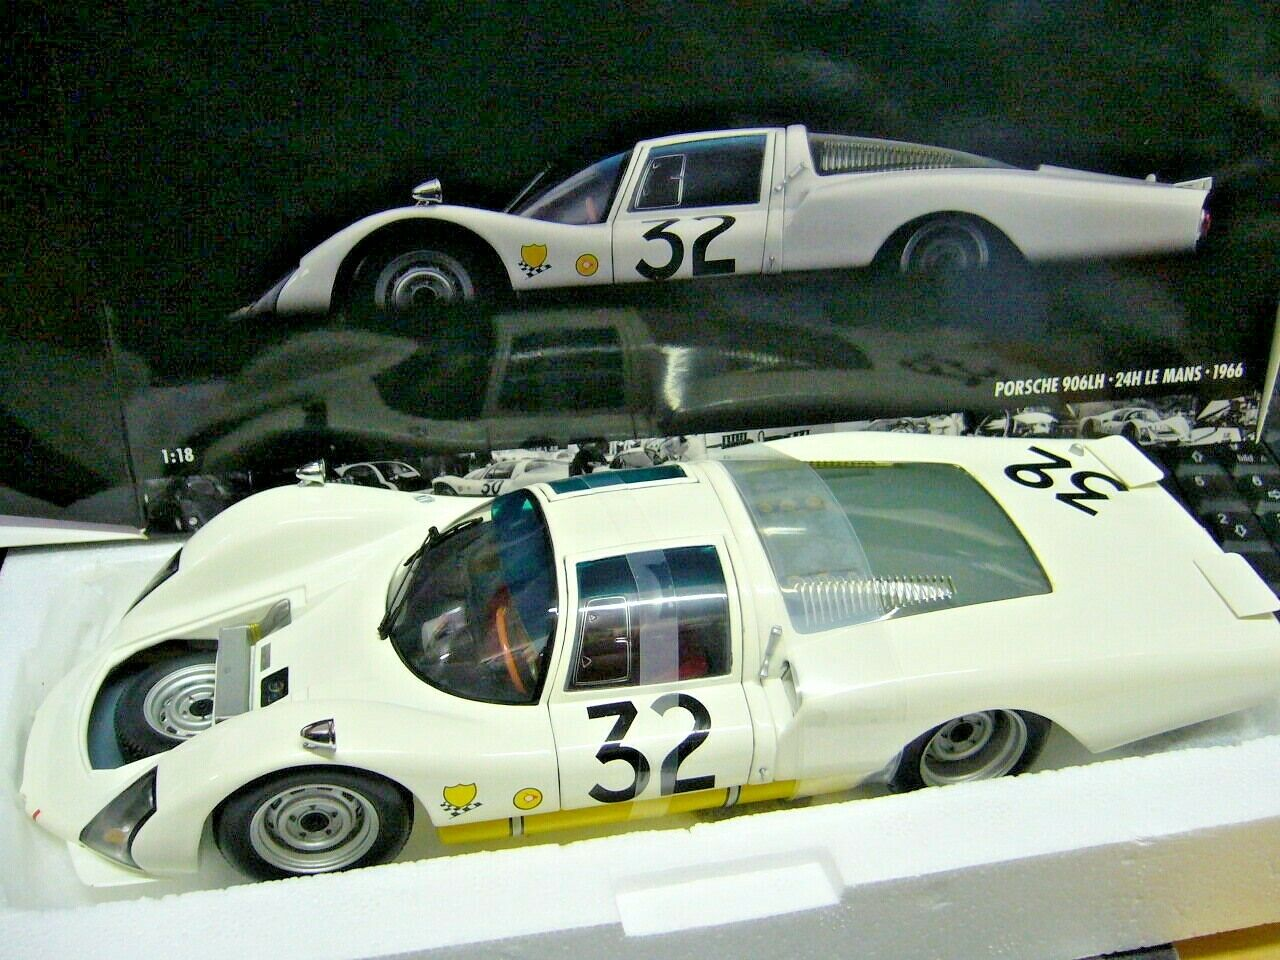 Porsche 906 LH Lang popa le mans Schütz V. klerk 1966 pma Minichamps 1 18